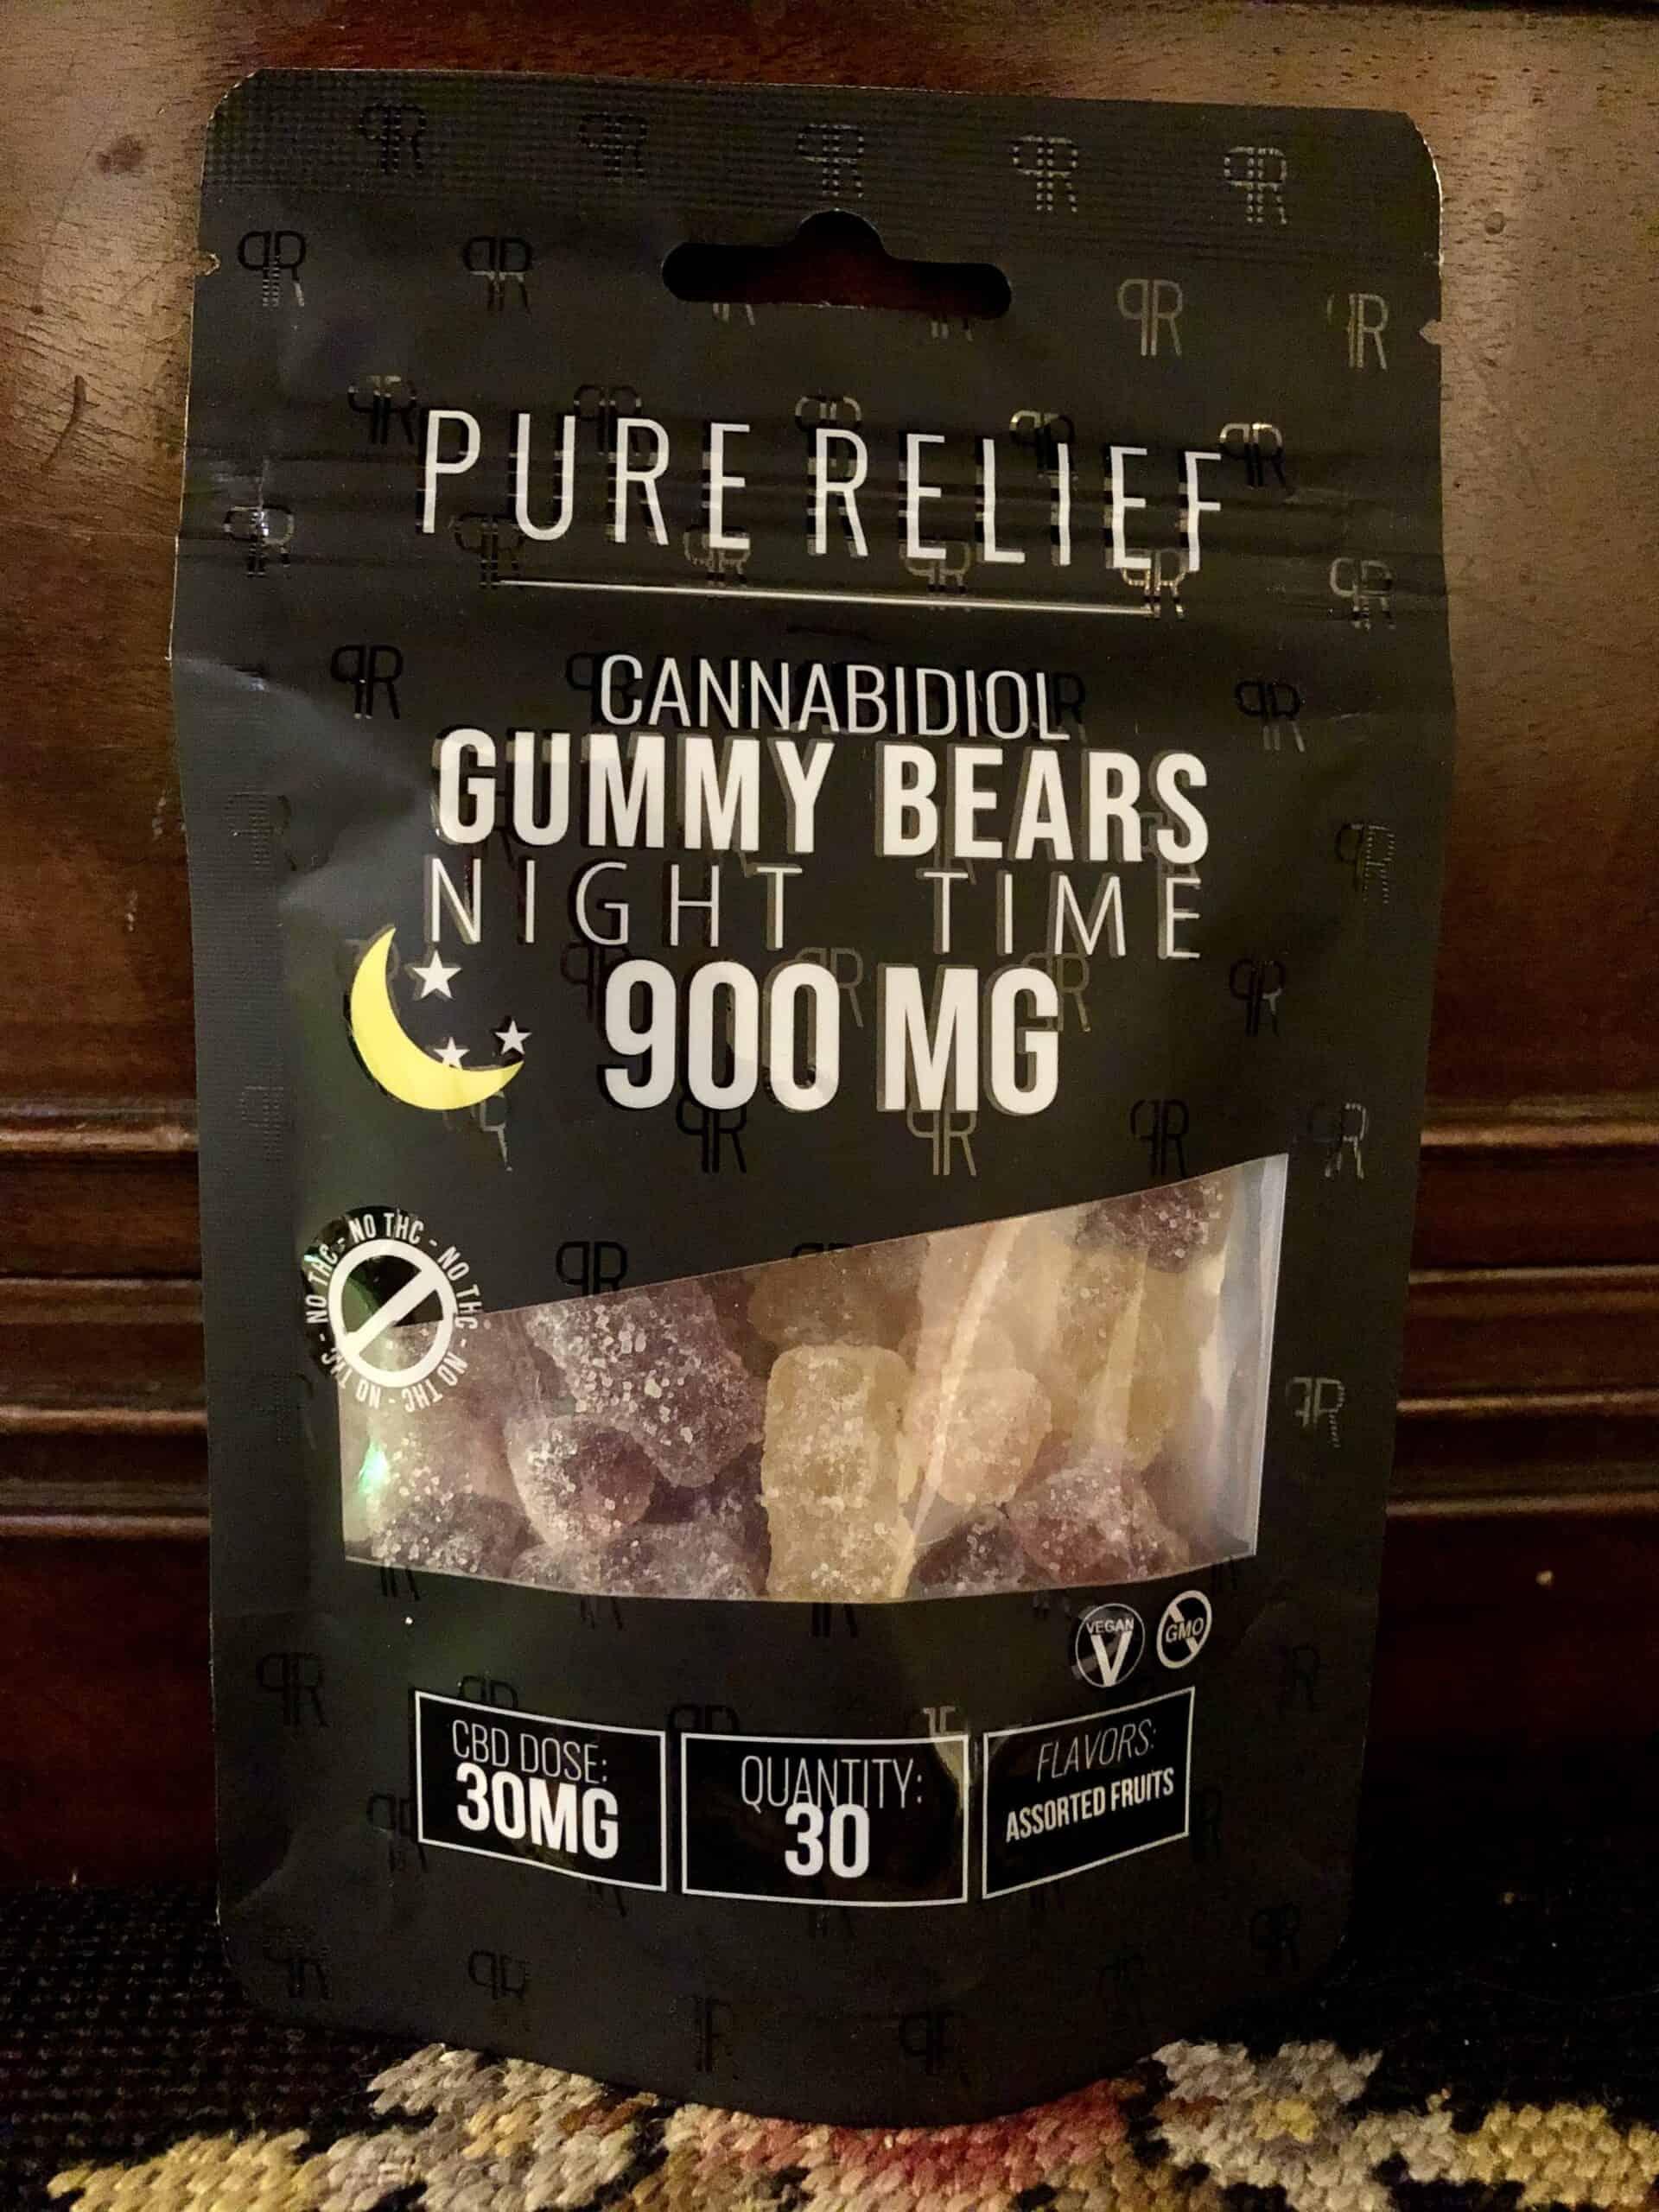 Pure Relief: CBD Night Time 900mg CBD Gummies